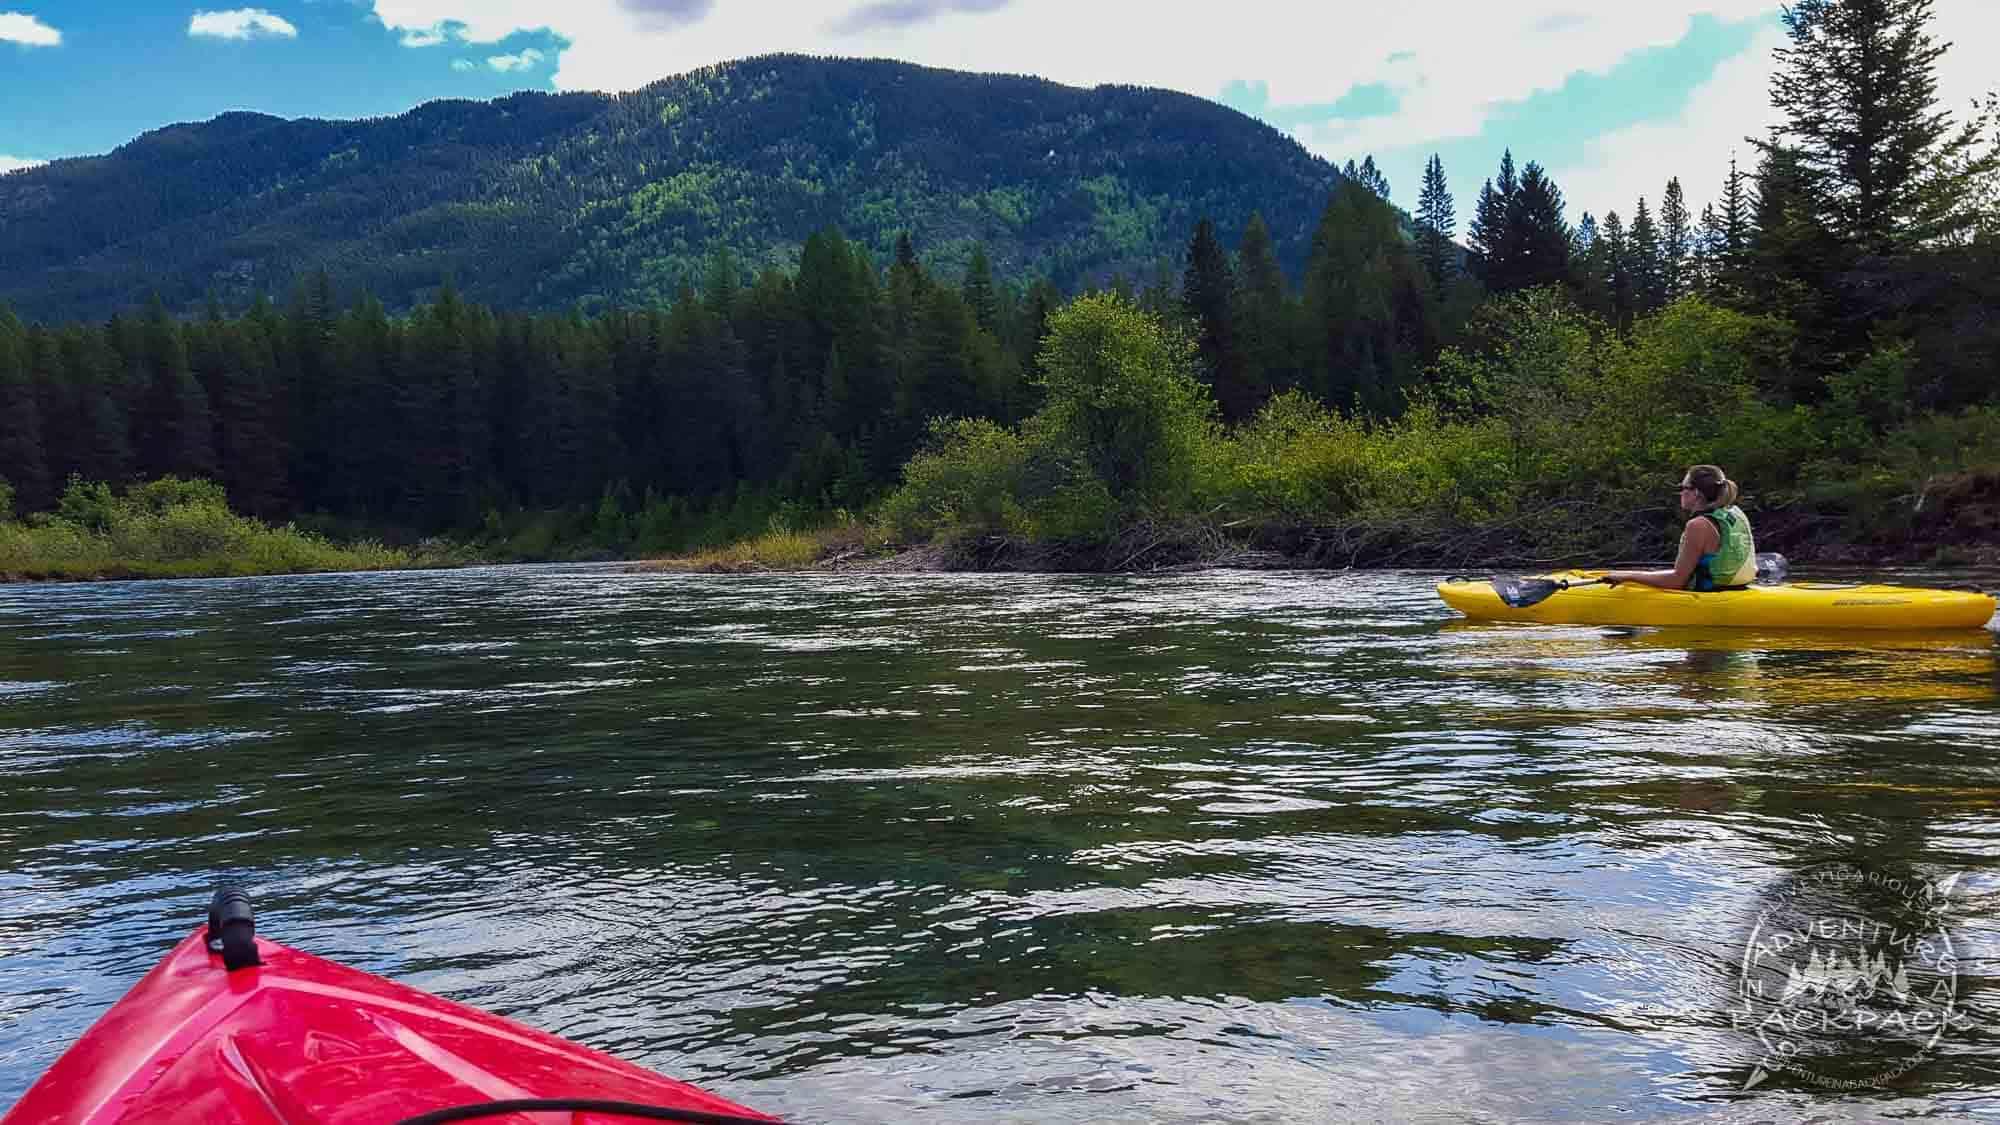 Kayaking Lake Mcdonald & Mcdonald Creek in Glacier National Park, Montana